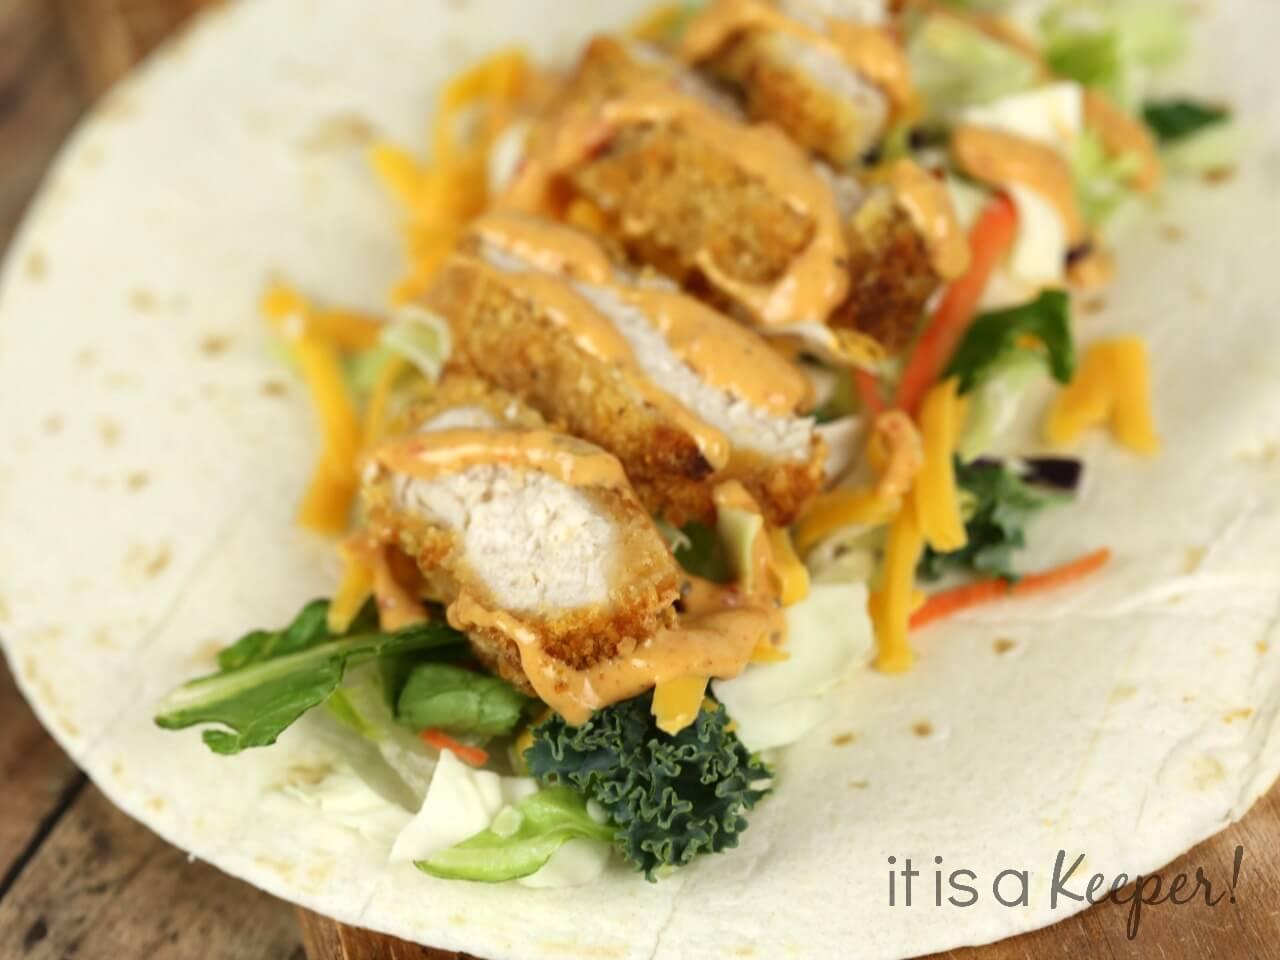 Southwest Chicken Wrap Recipe